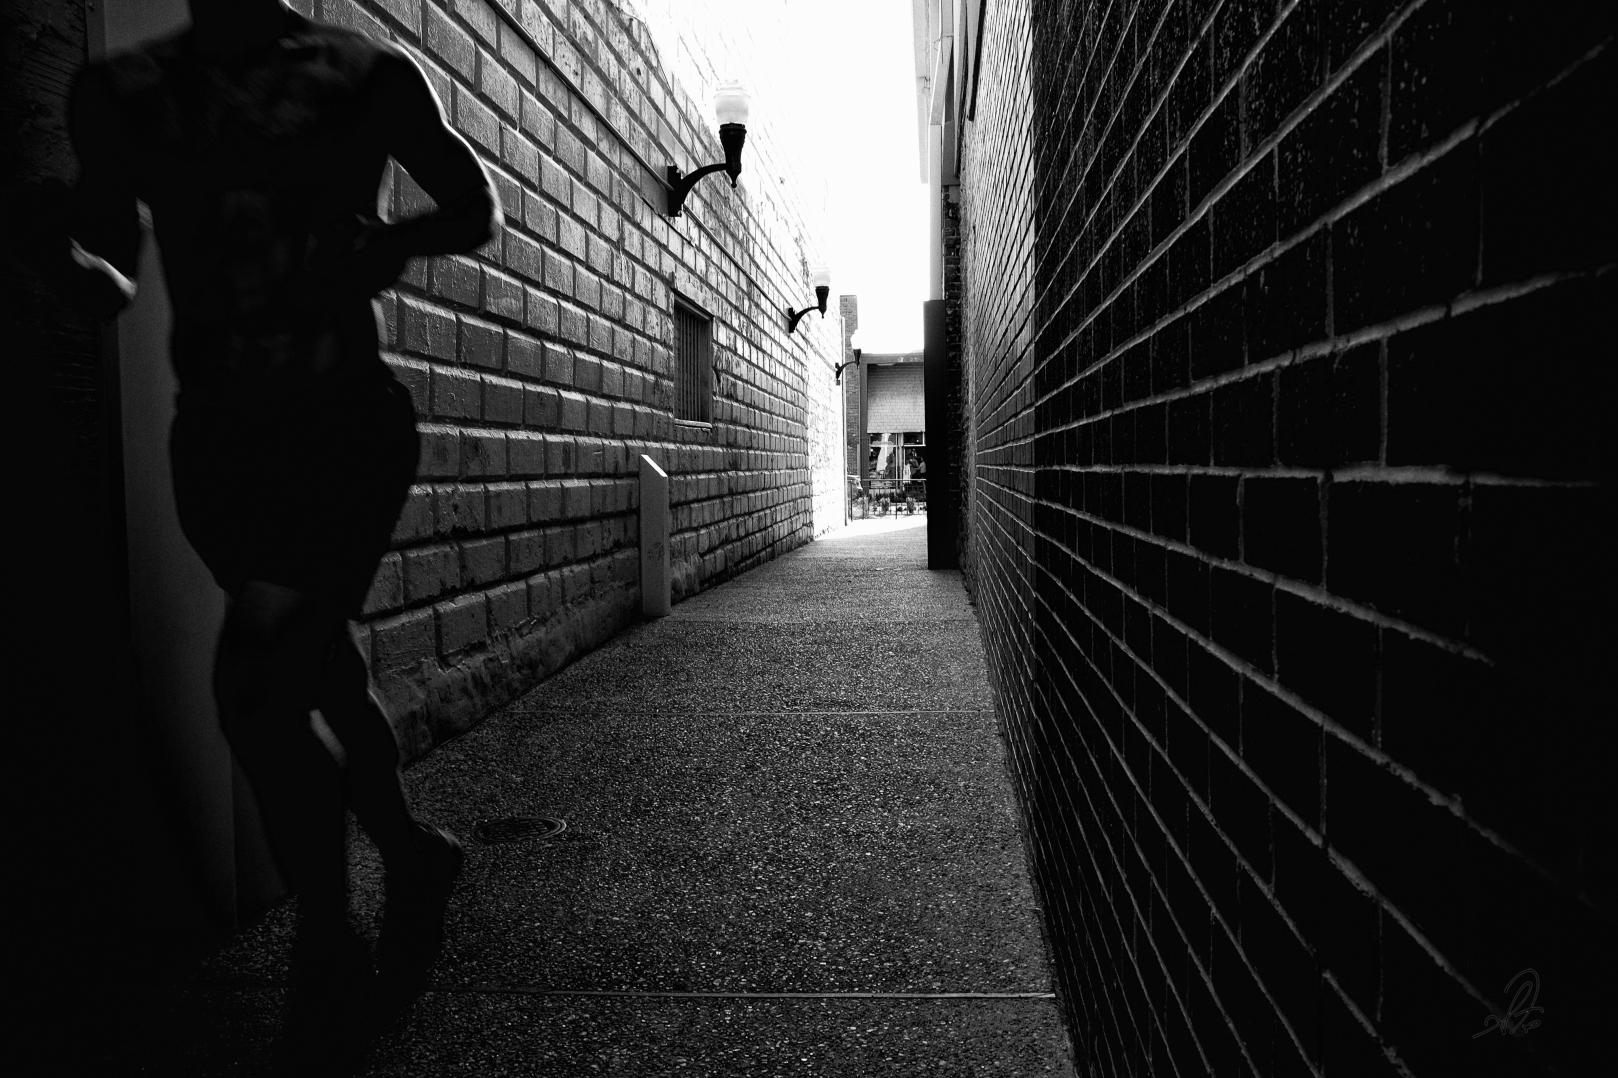 Alley Runner